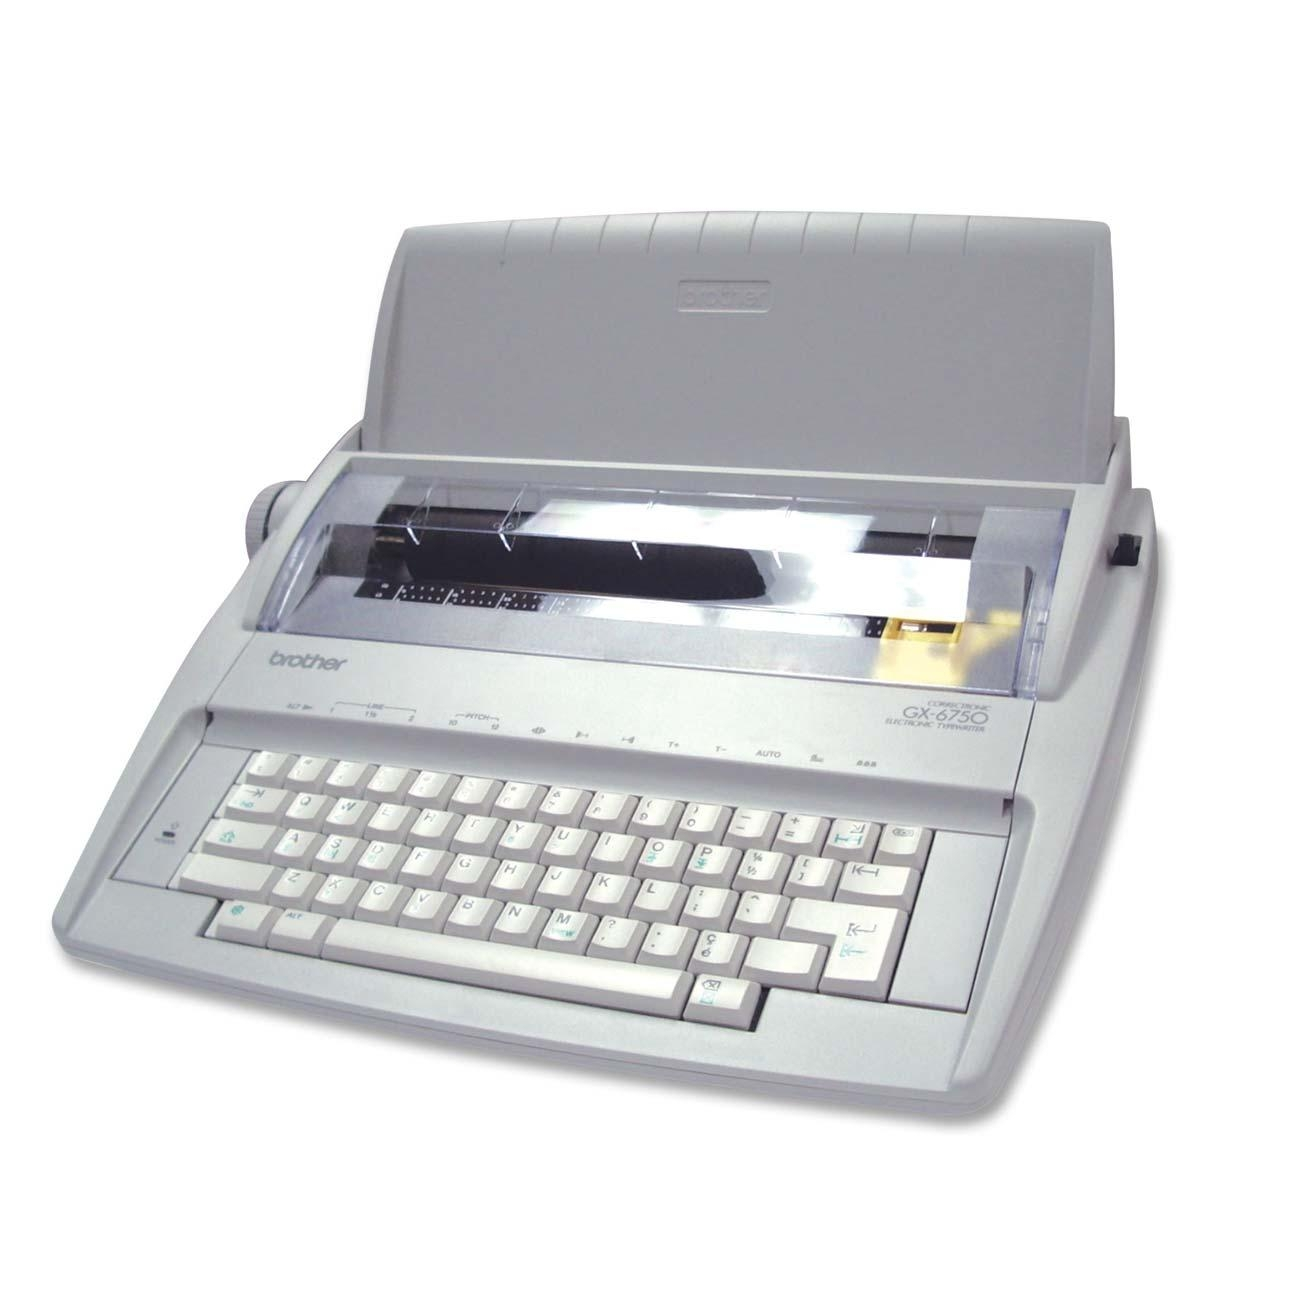 brother gx 6750 daisy wheel electronic typewriter walmart com rh walmart com Brother GX-6750 User Manual brother gx-6750 portable electronic typewriter manual